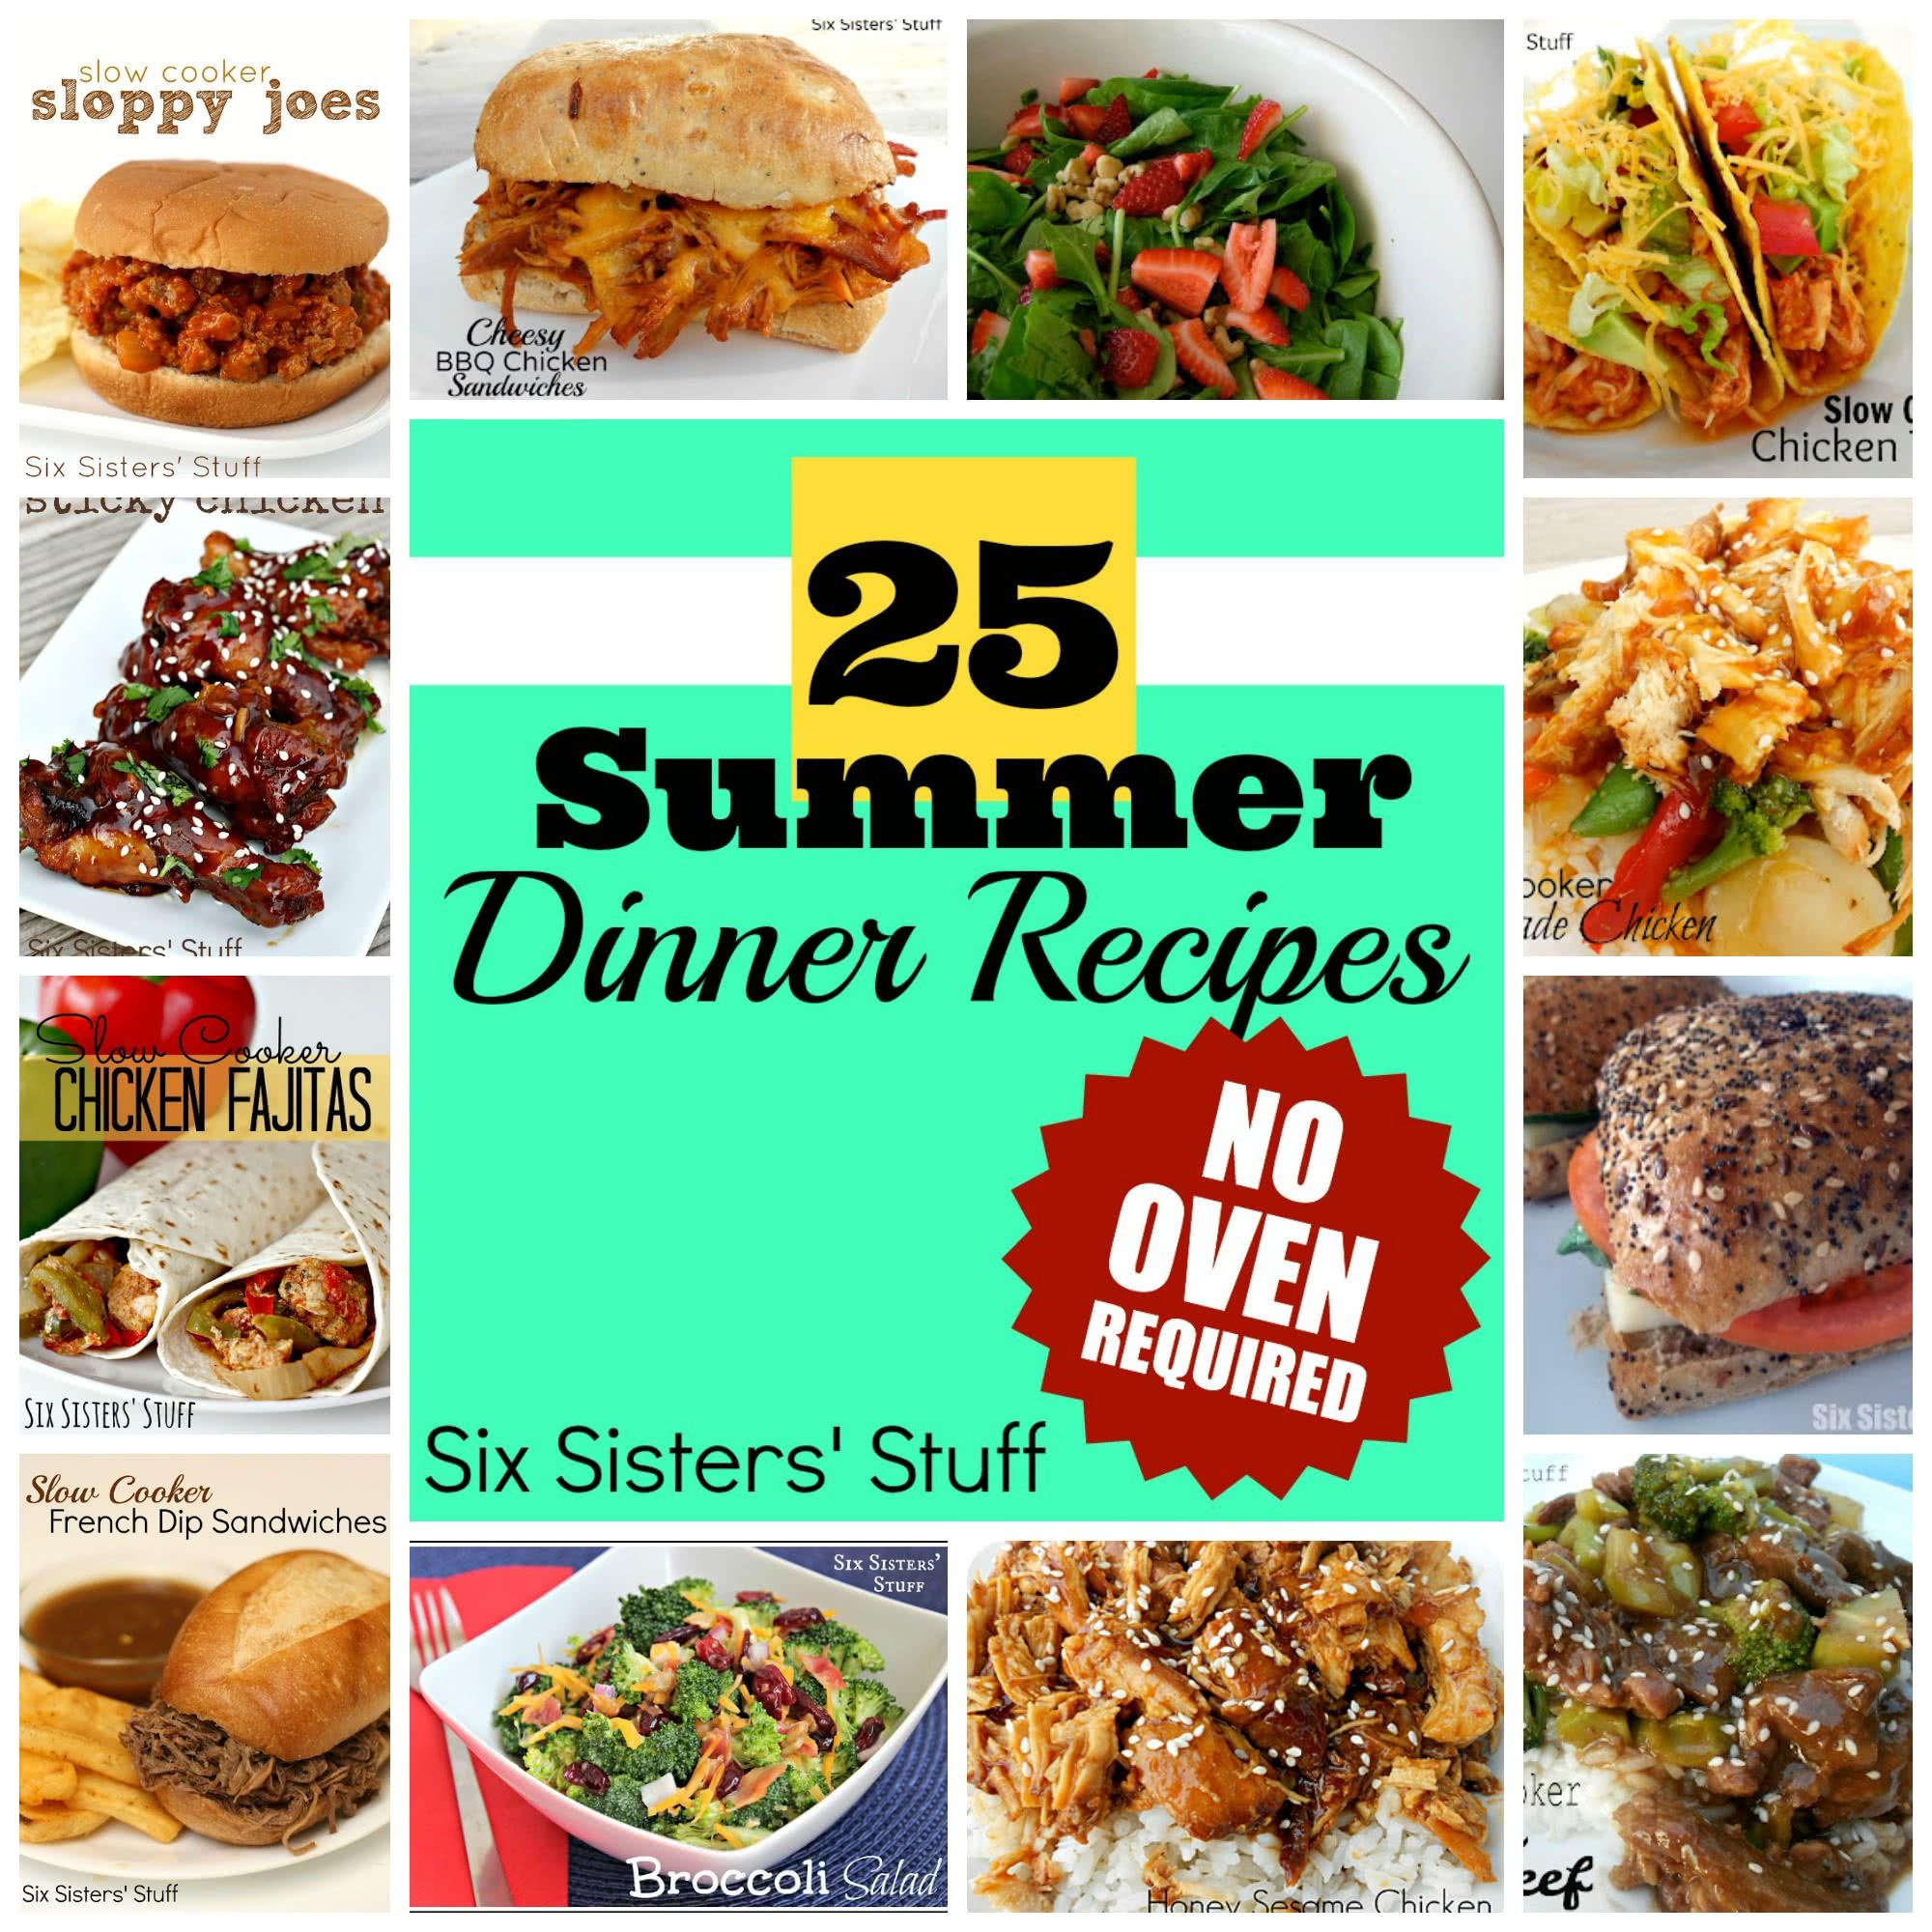 Summer Dinner Recipe  Slow Cooker Mexican Hashbrown Casserole